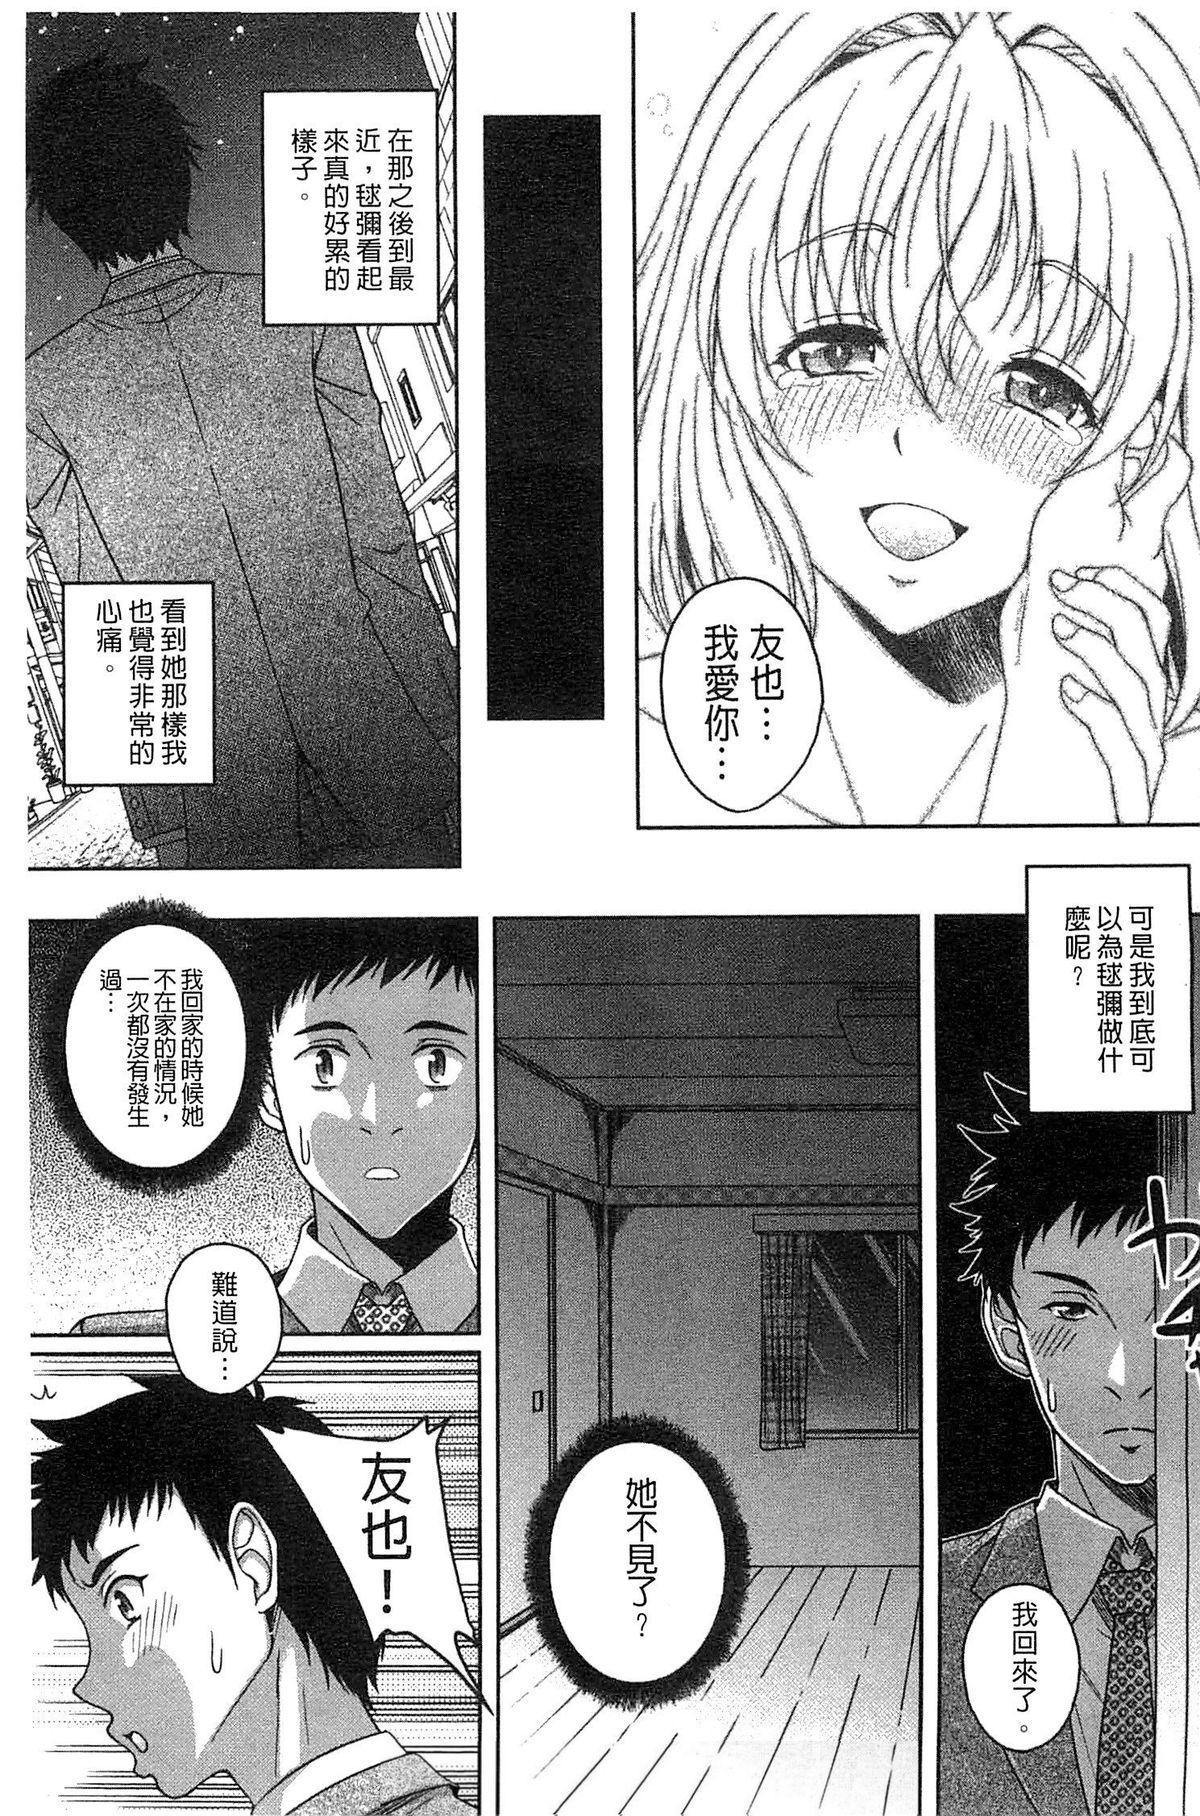 Hajimete nan dakara - First sexual experience 201